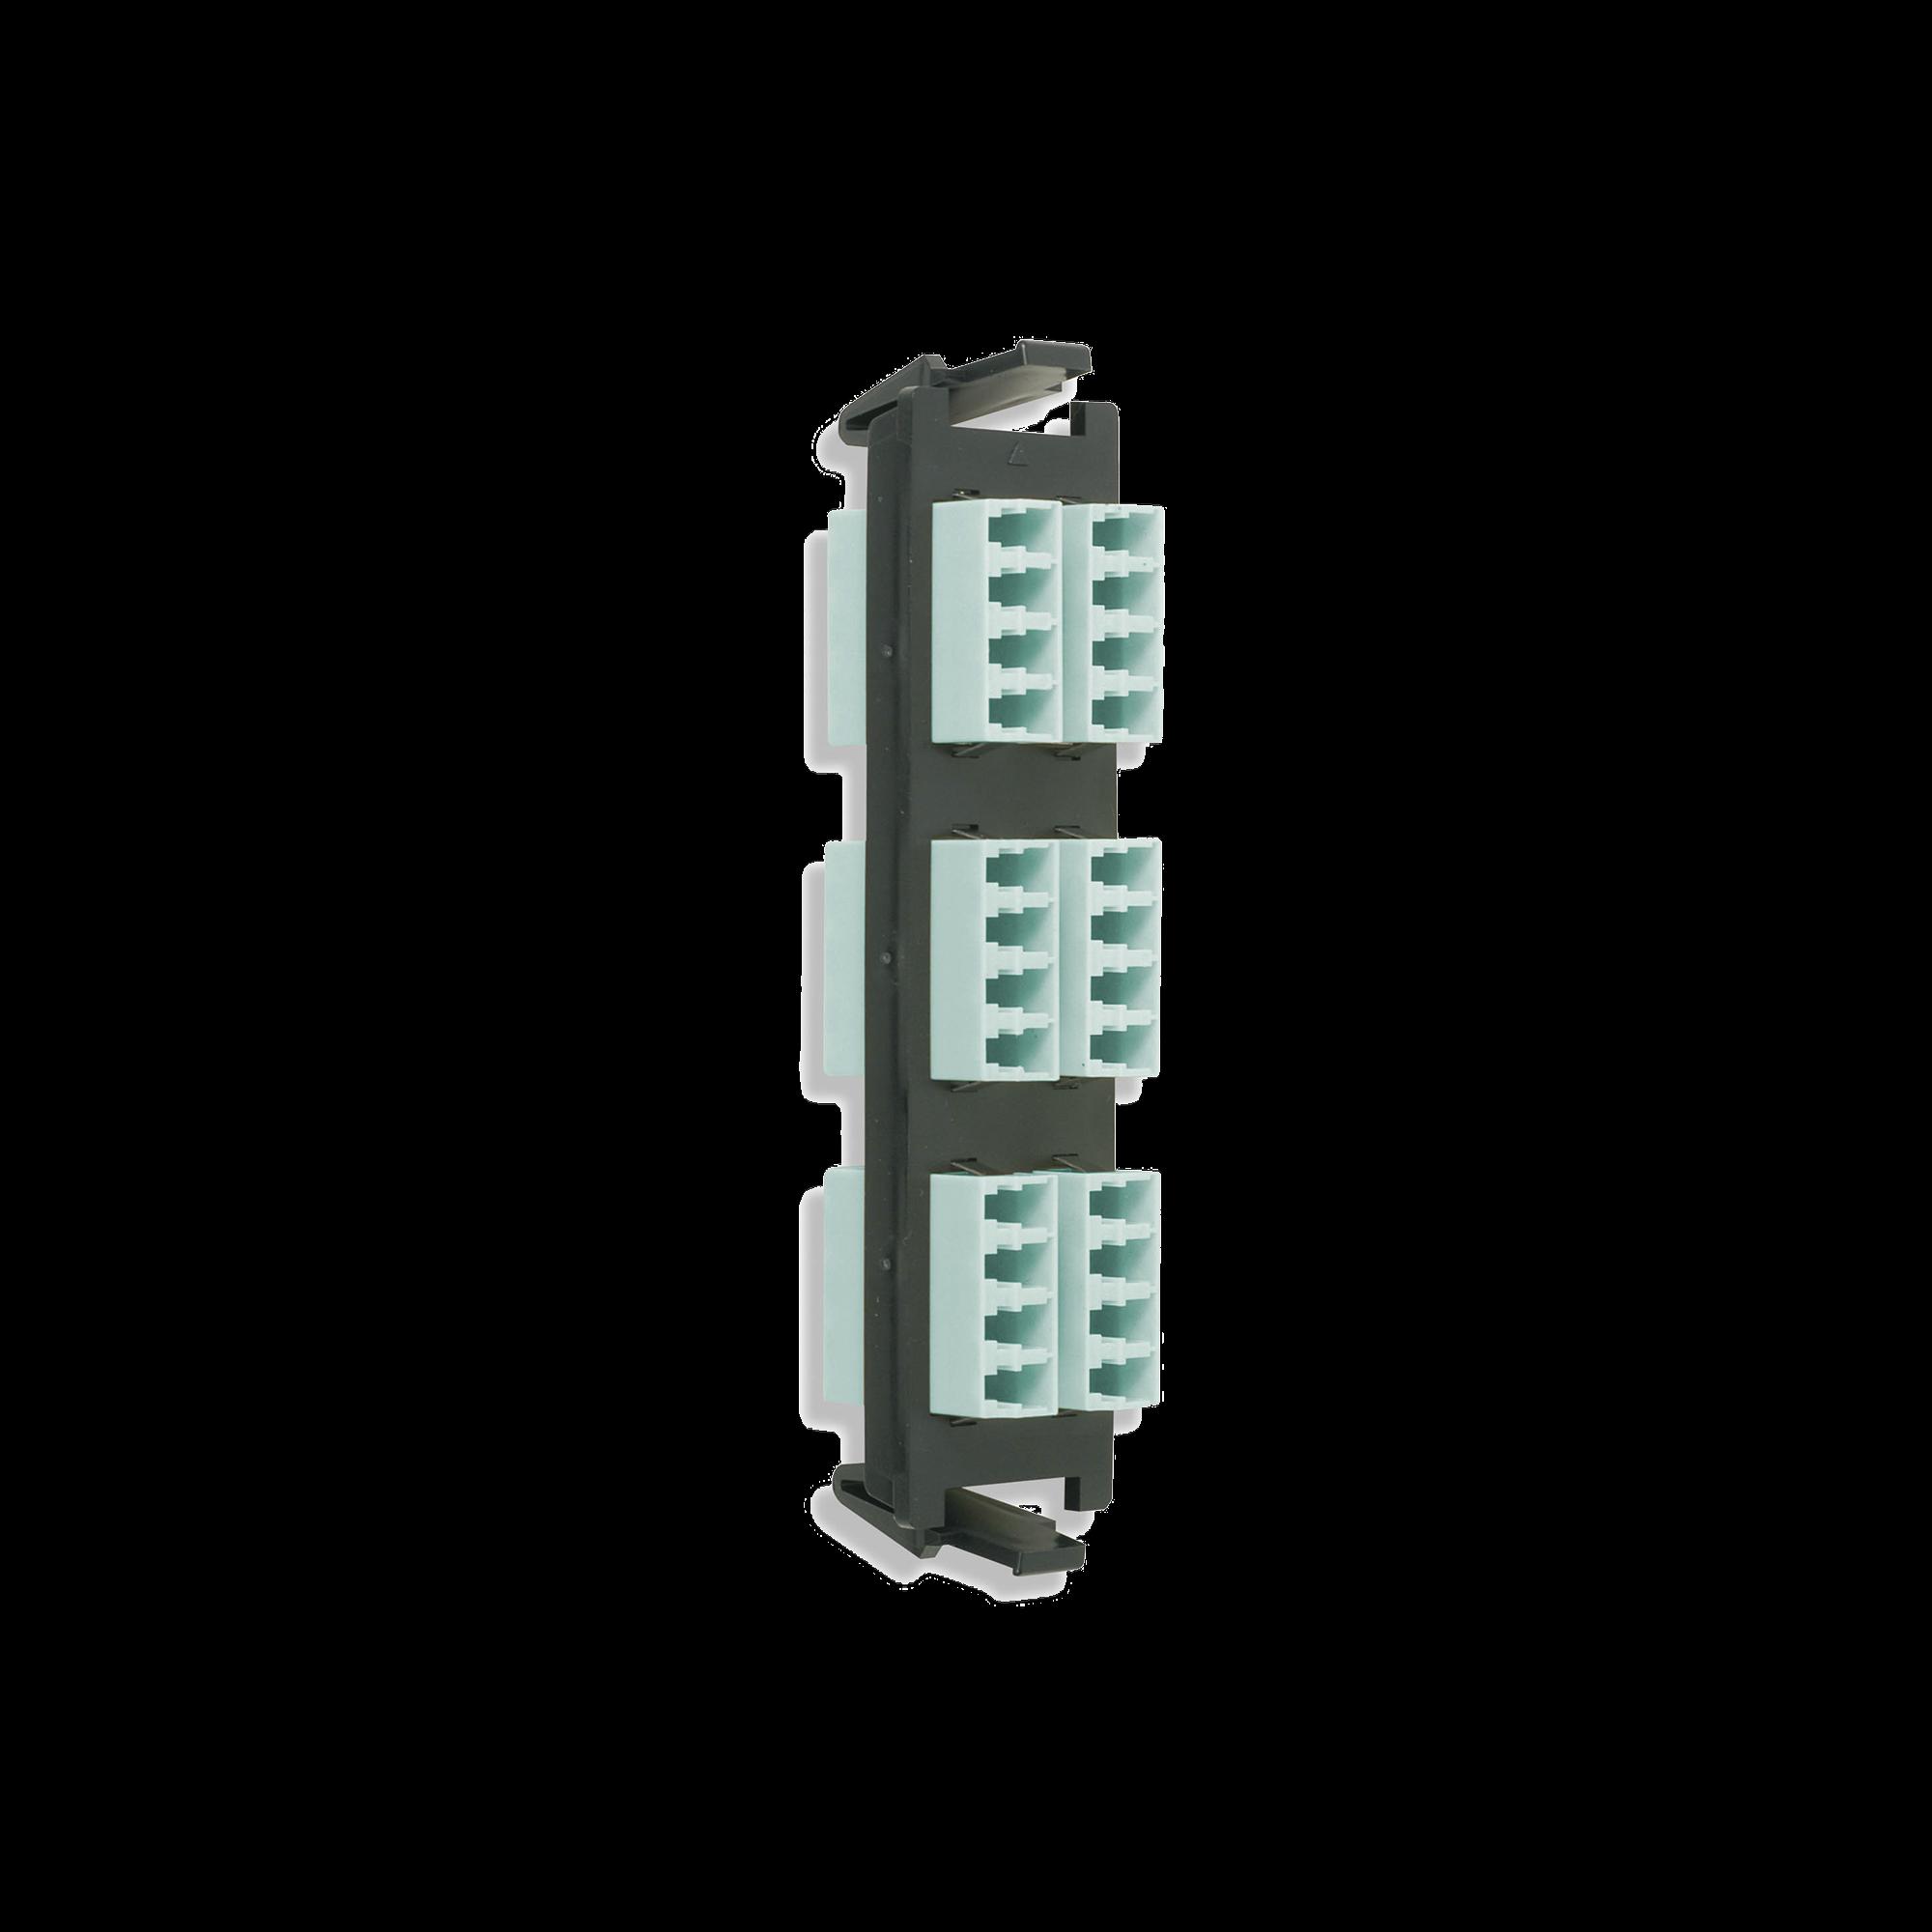 Placa acopladora de Fibra óptica Quick-Pack, Con 6 Conectores LC Quad (24 Fibras), Para Fibra Multimodo, Aqua